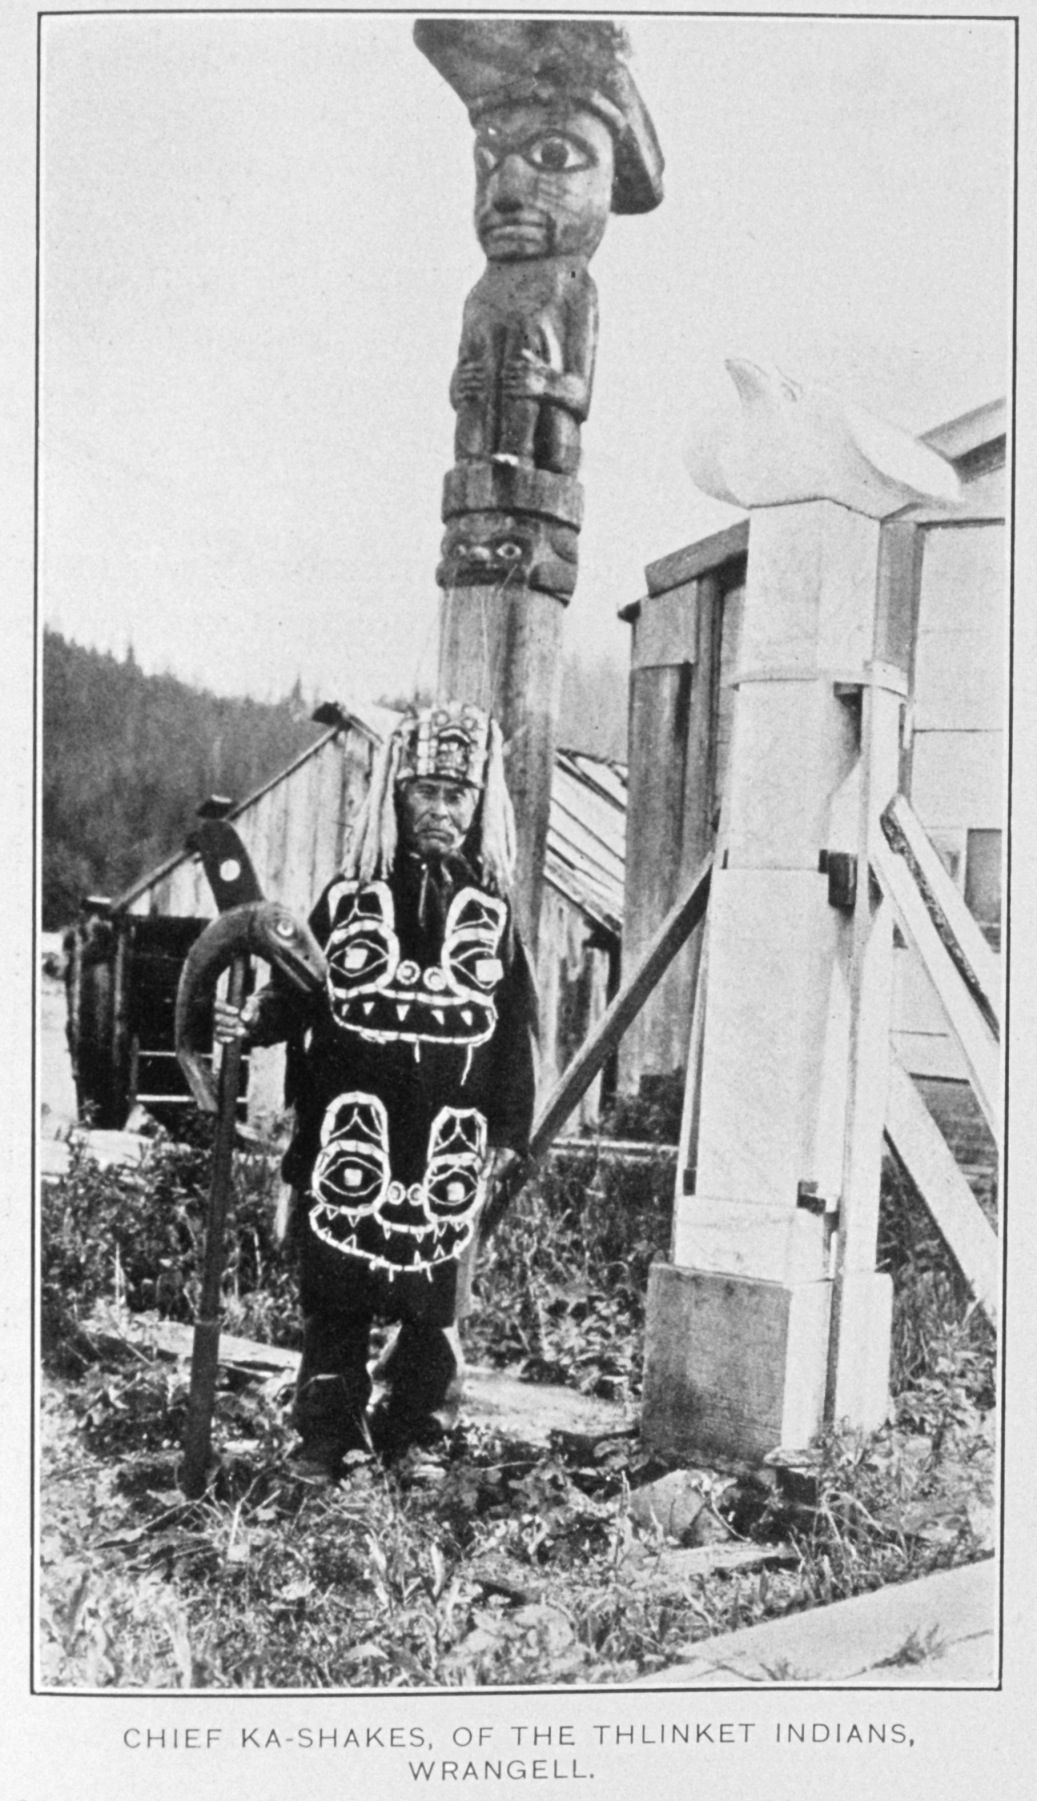 Wrangel Chief Ka Shakes